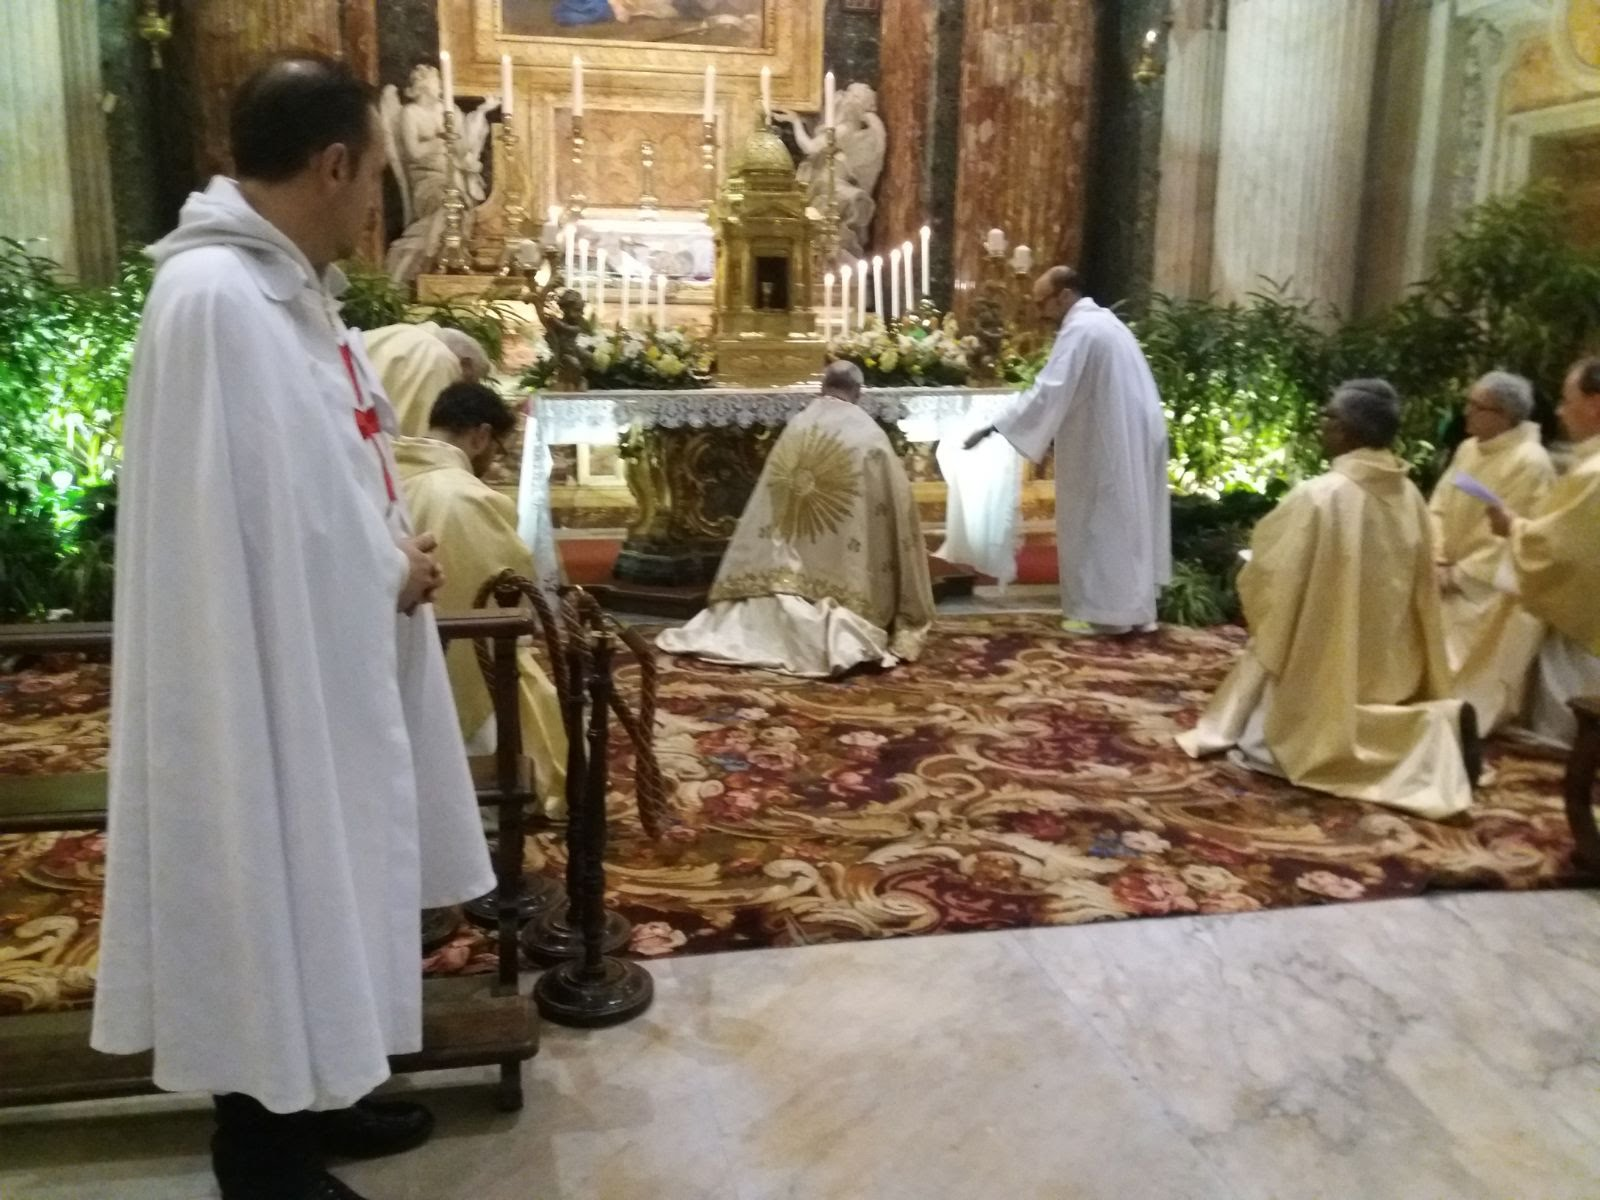 templari giovedi santo 2018 roma